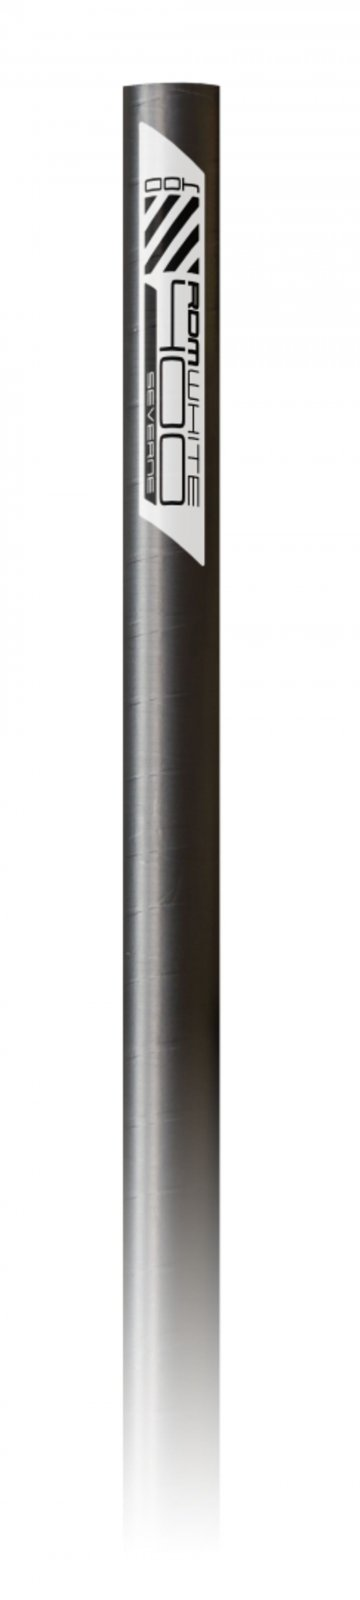 Severne RDM White Mast